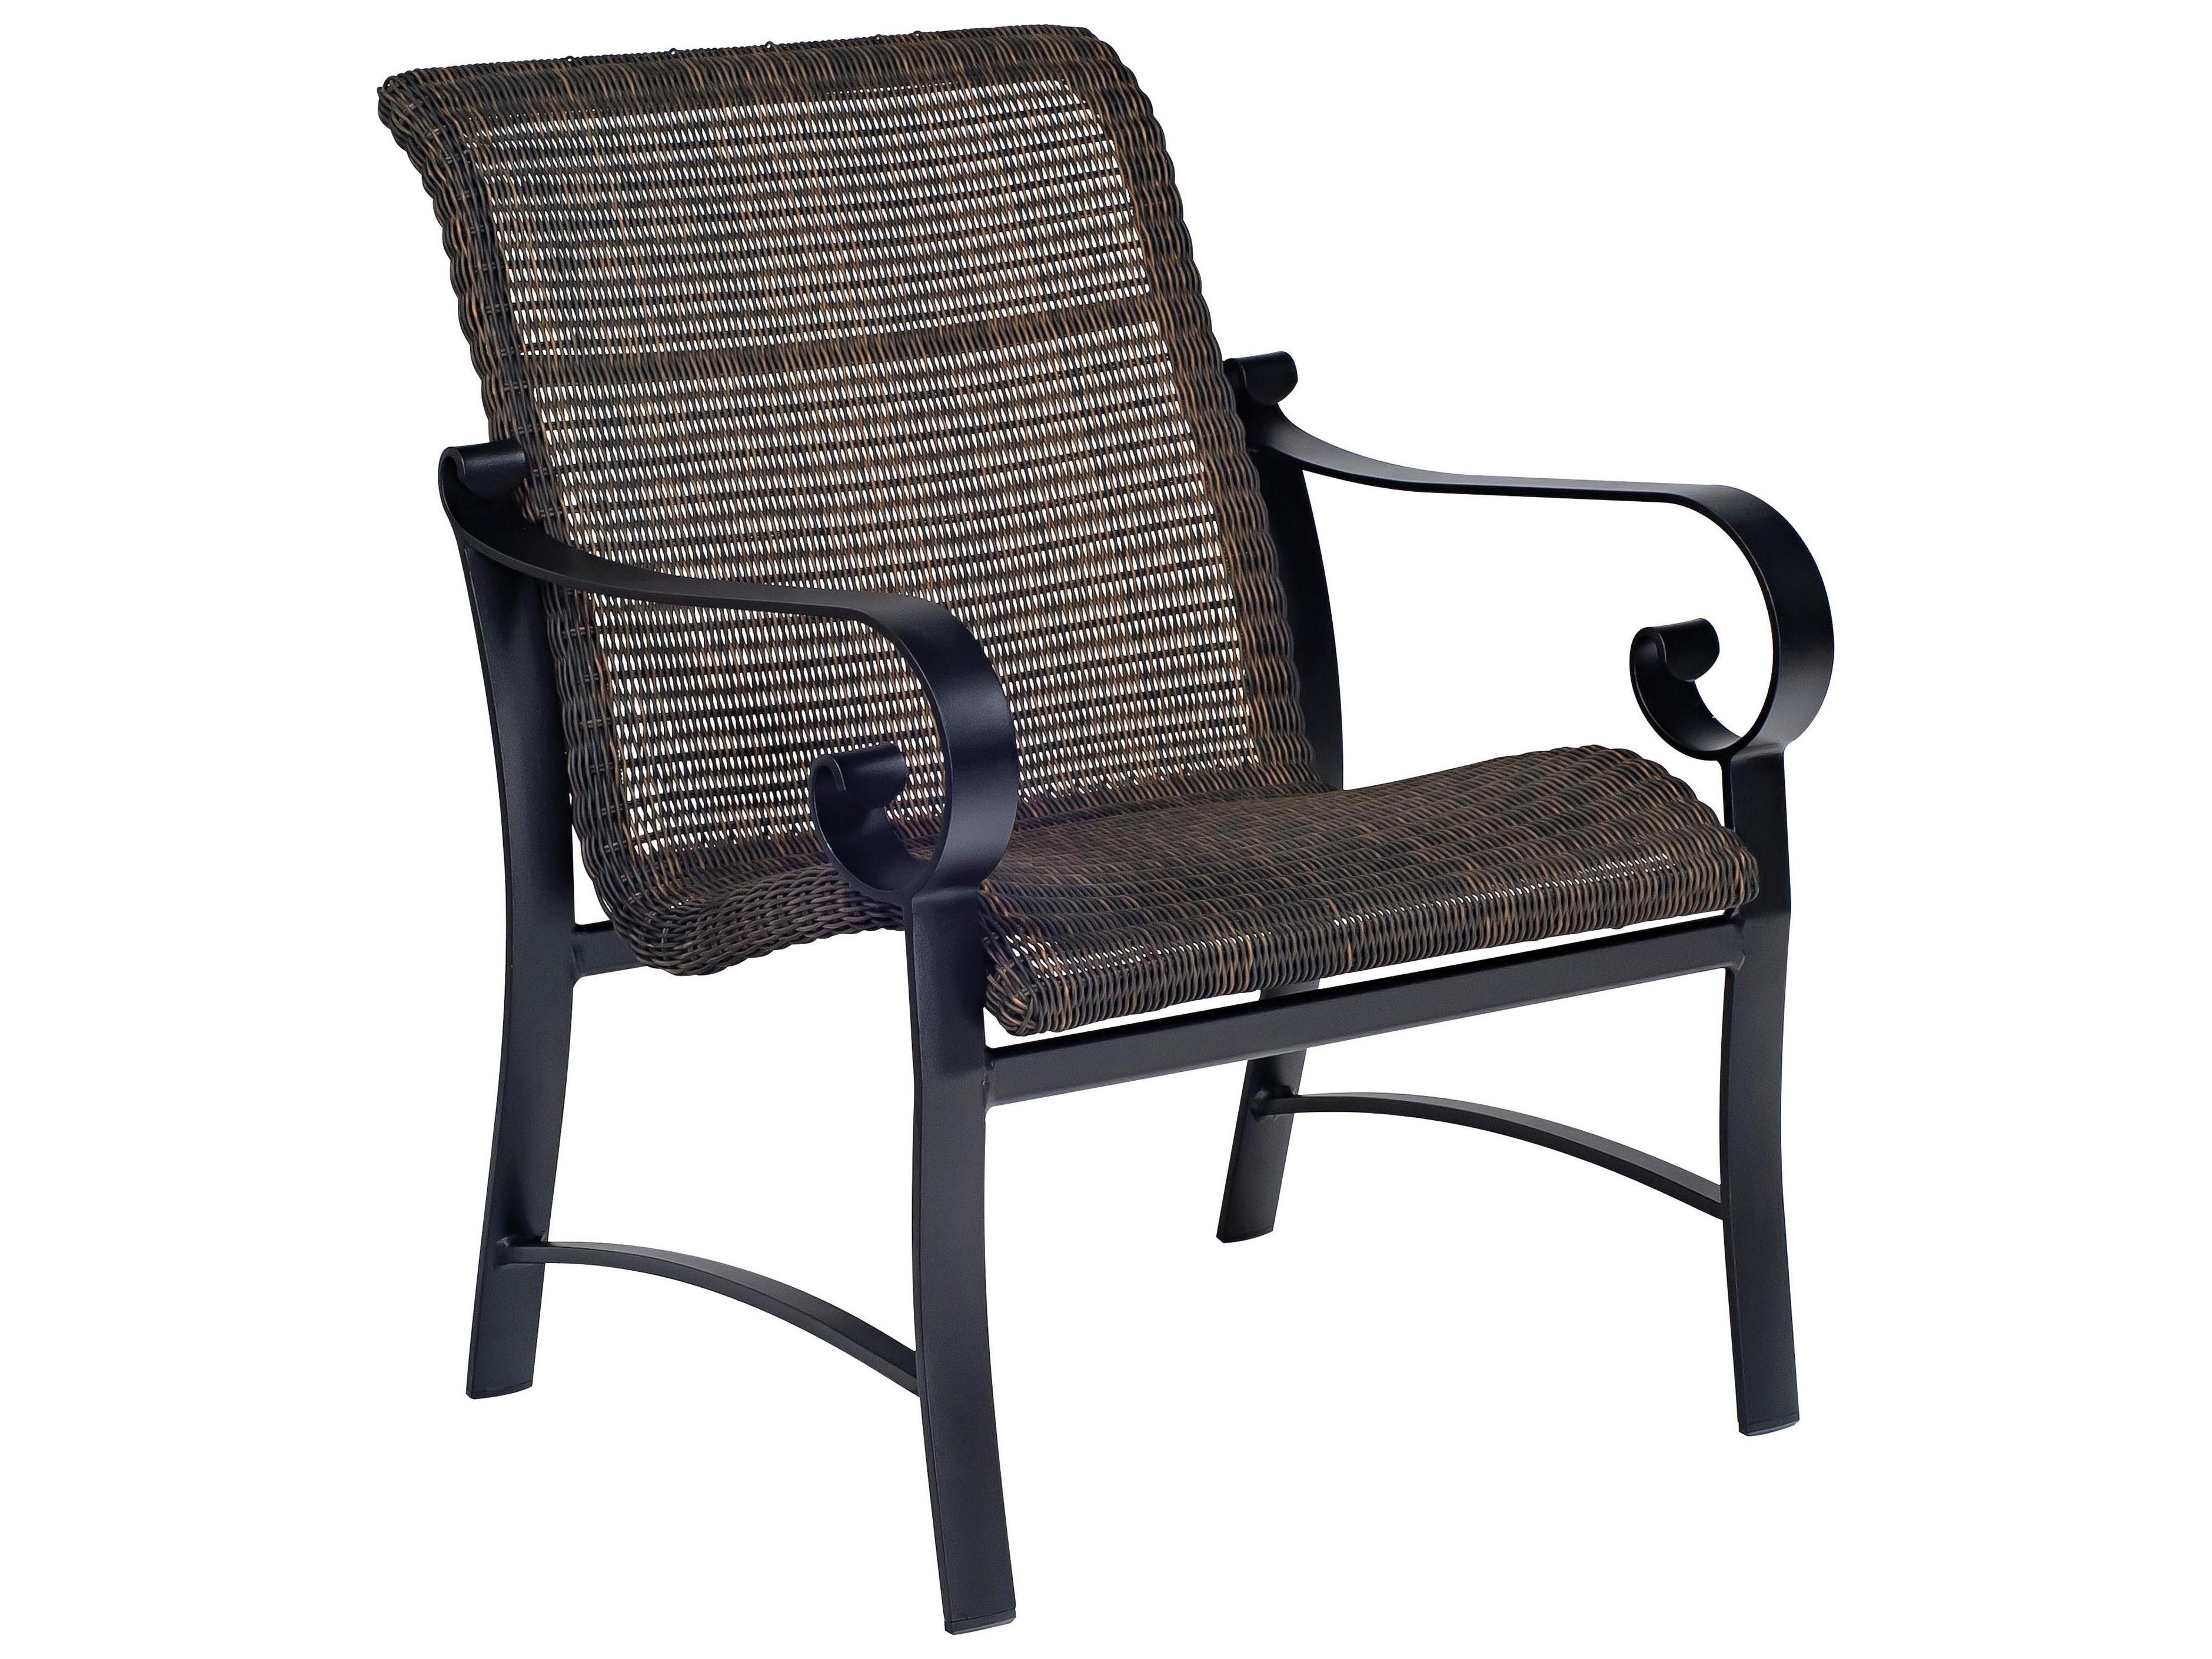 woodard belden woven round weave wicker lounge chair. Black Bedroom Furniture Sets. Home Design Ideas